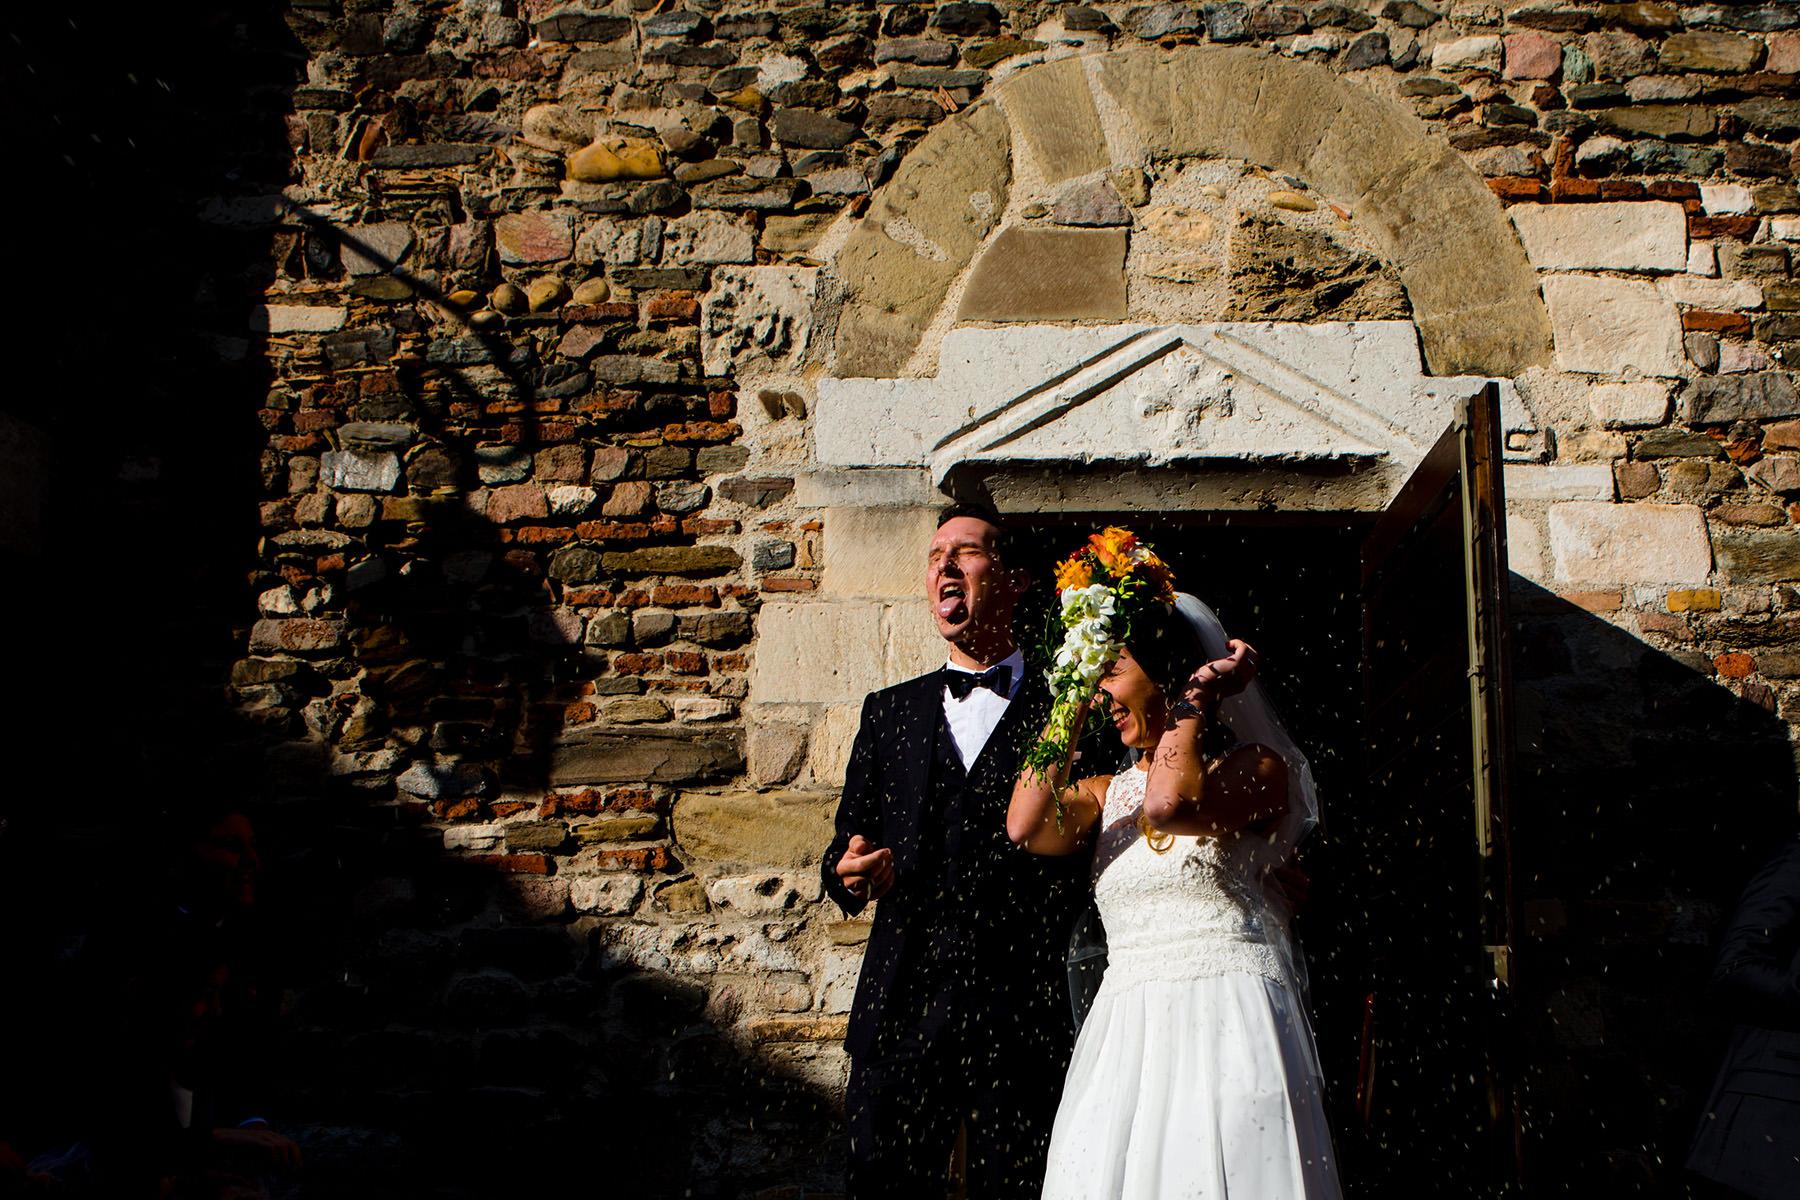 narracia-wygledacz-photographe-mariage-portfolio-58.jpg